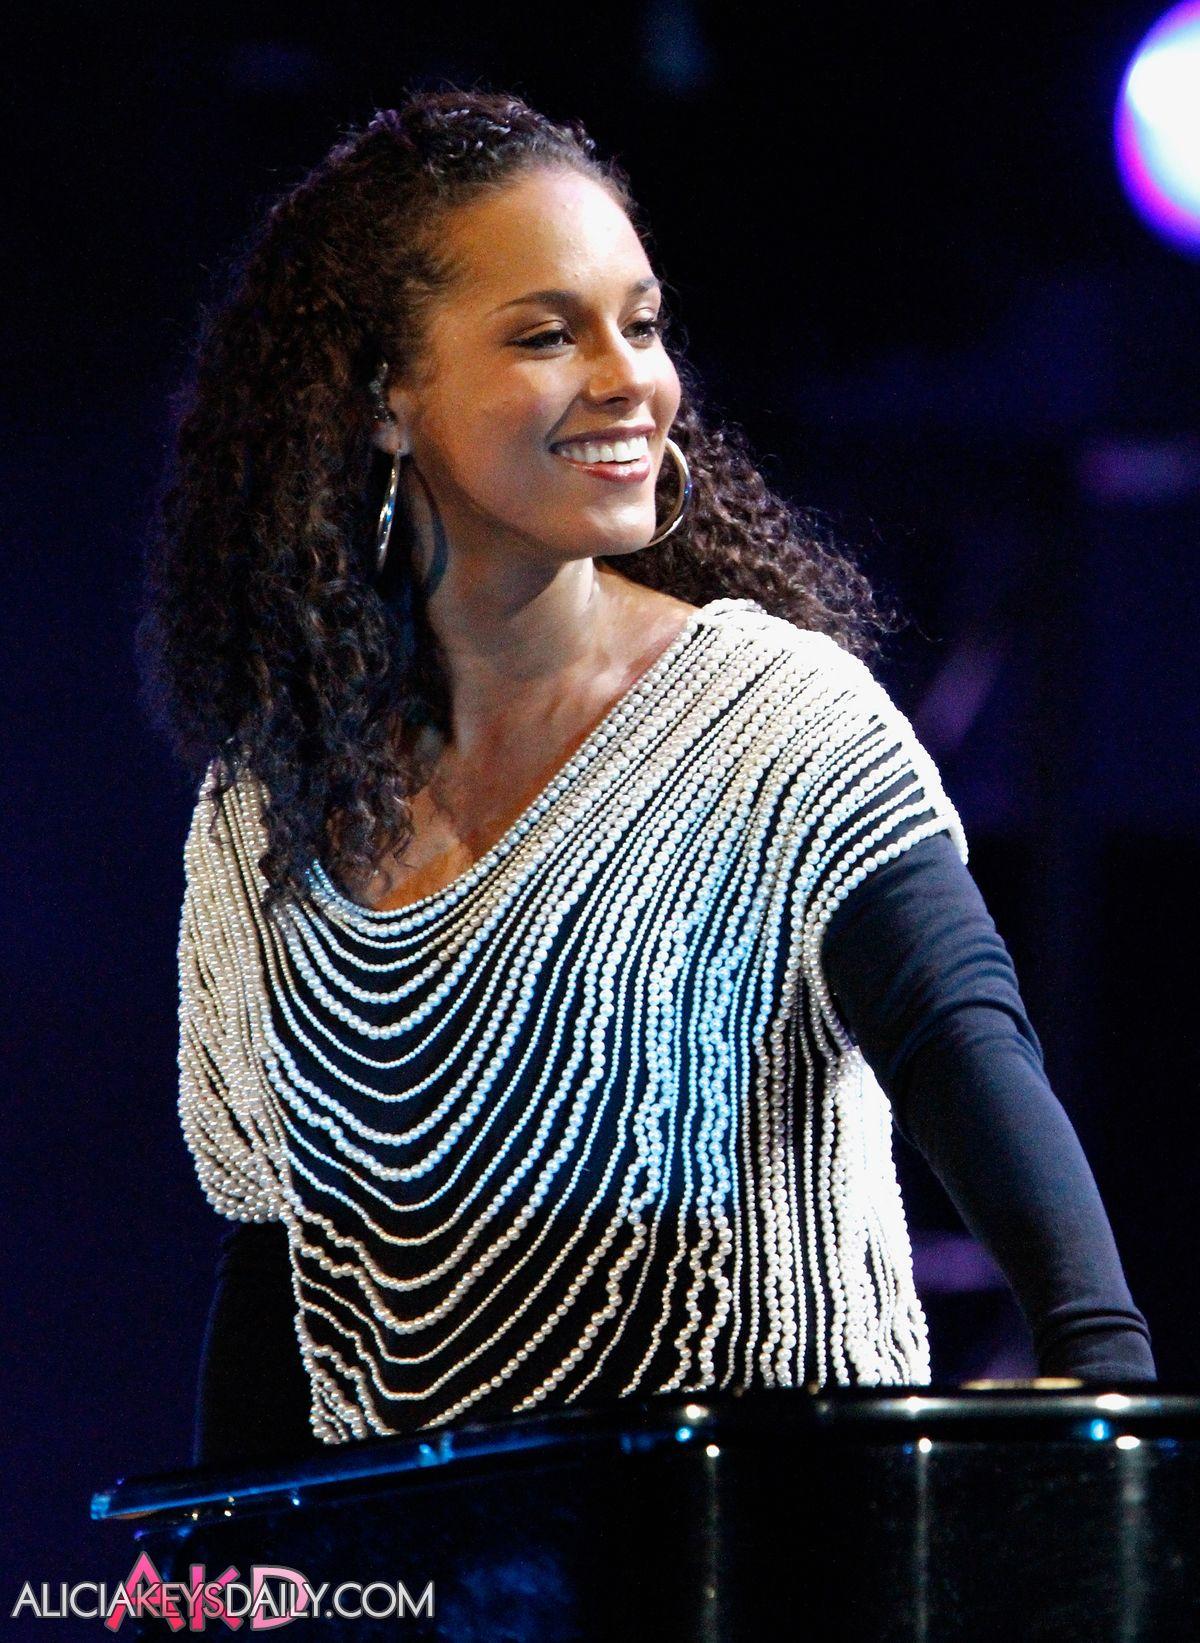 Alicia Keys World Cup Kick Off Celebration Concert on June 10, 2010